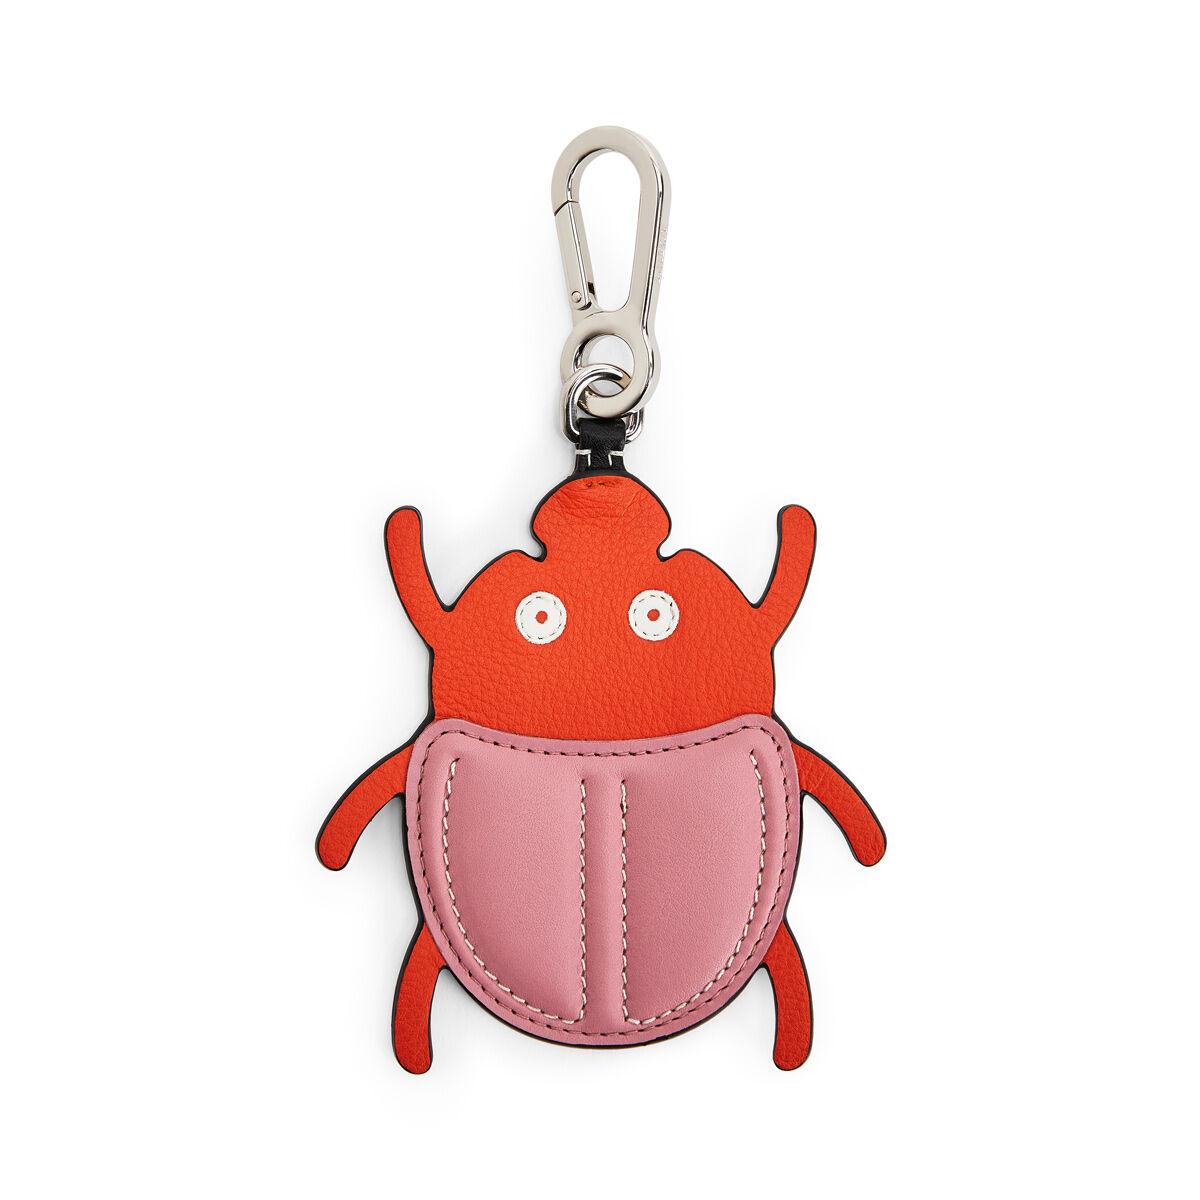 LOEWE Beetle Charm Pink/Orange all